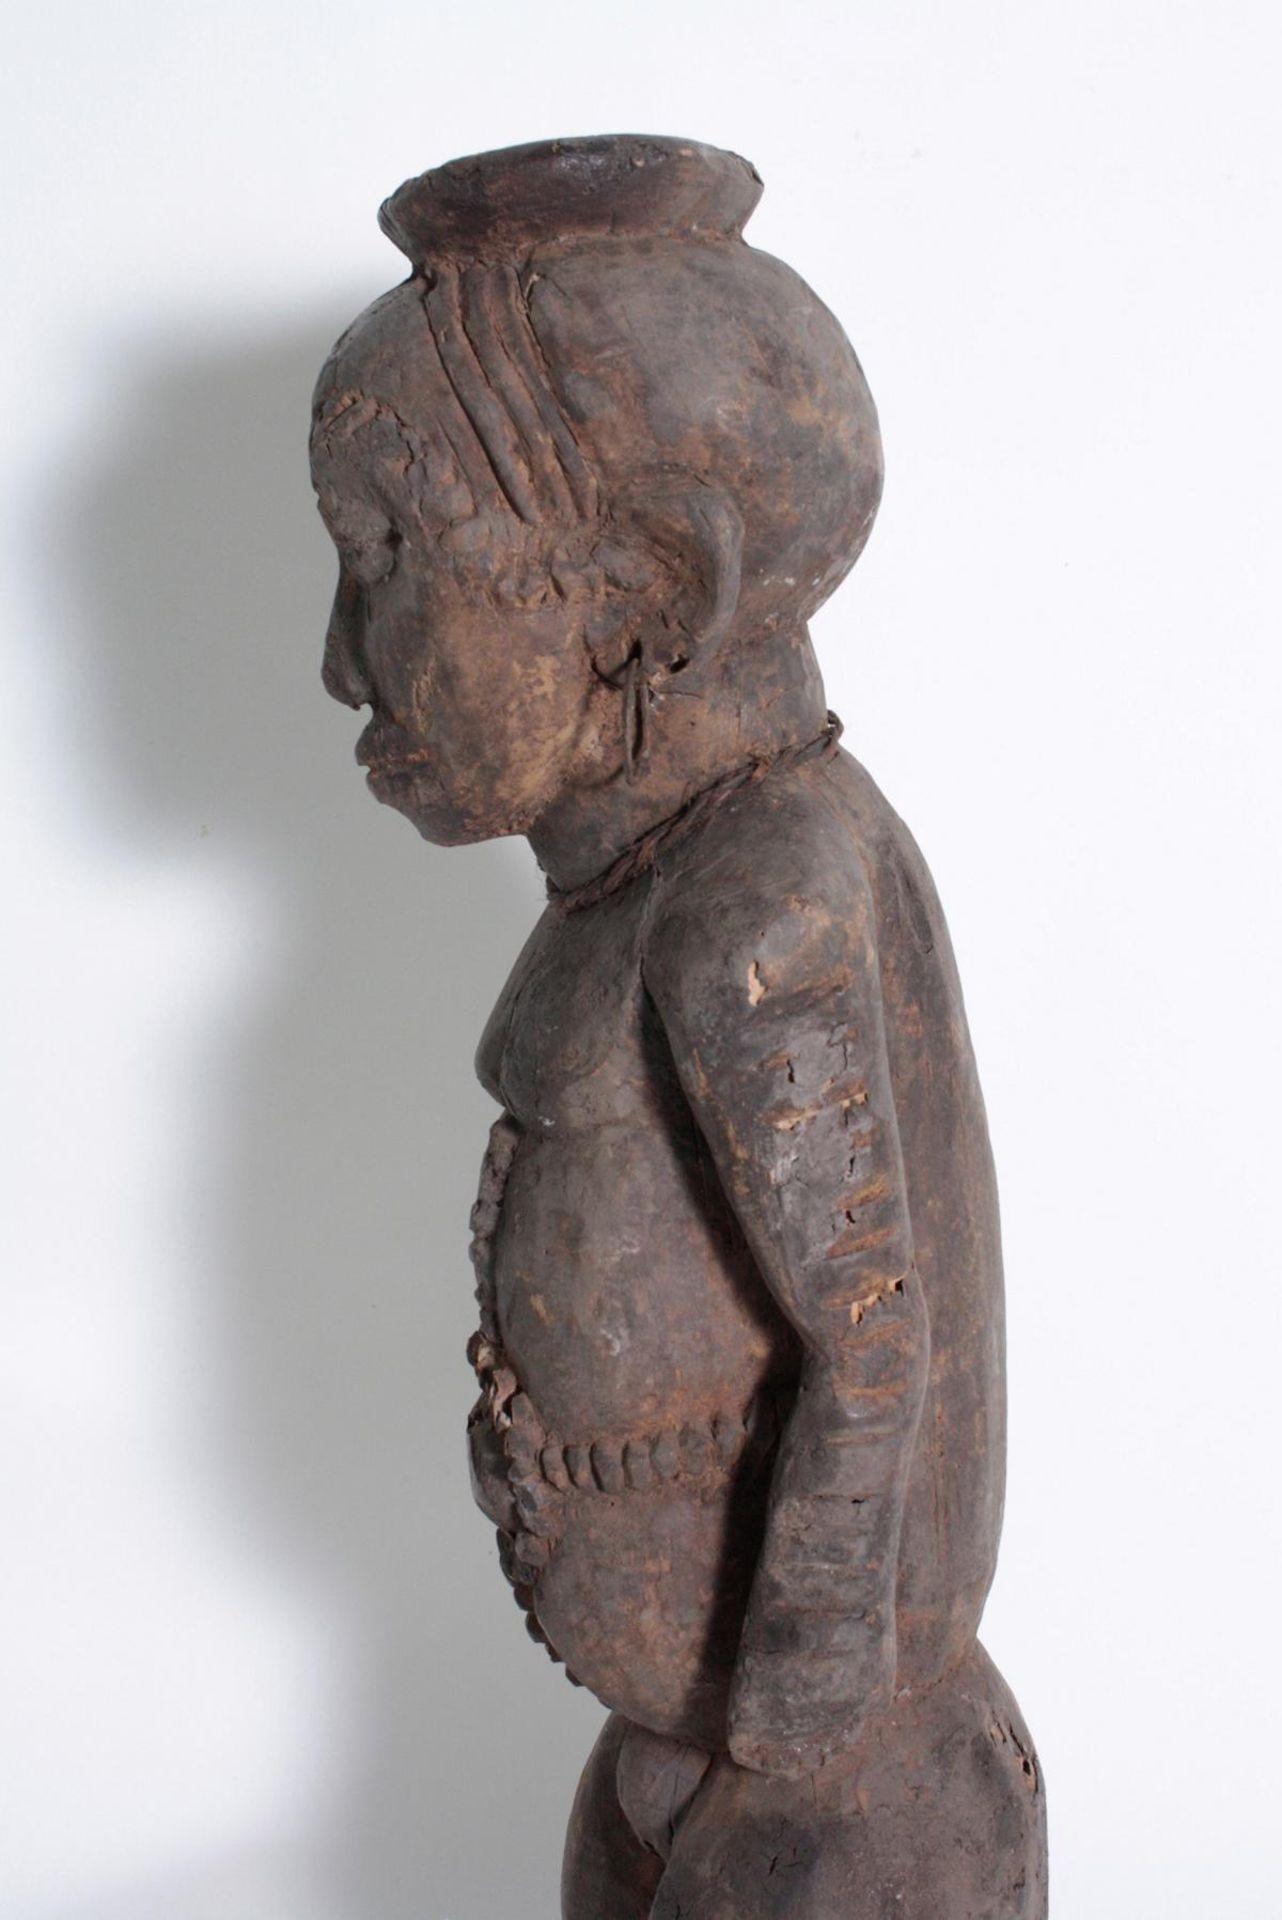 Ältere Ahnen-Figur, Tabwa, D. R. Kongo - Bild 5 aus 14